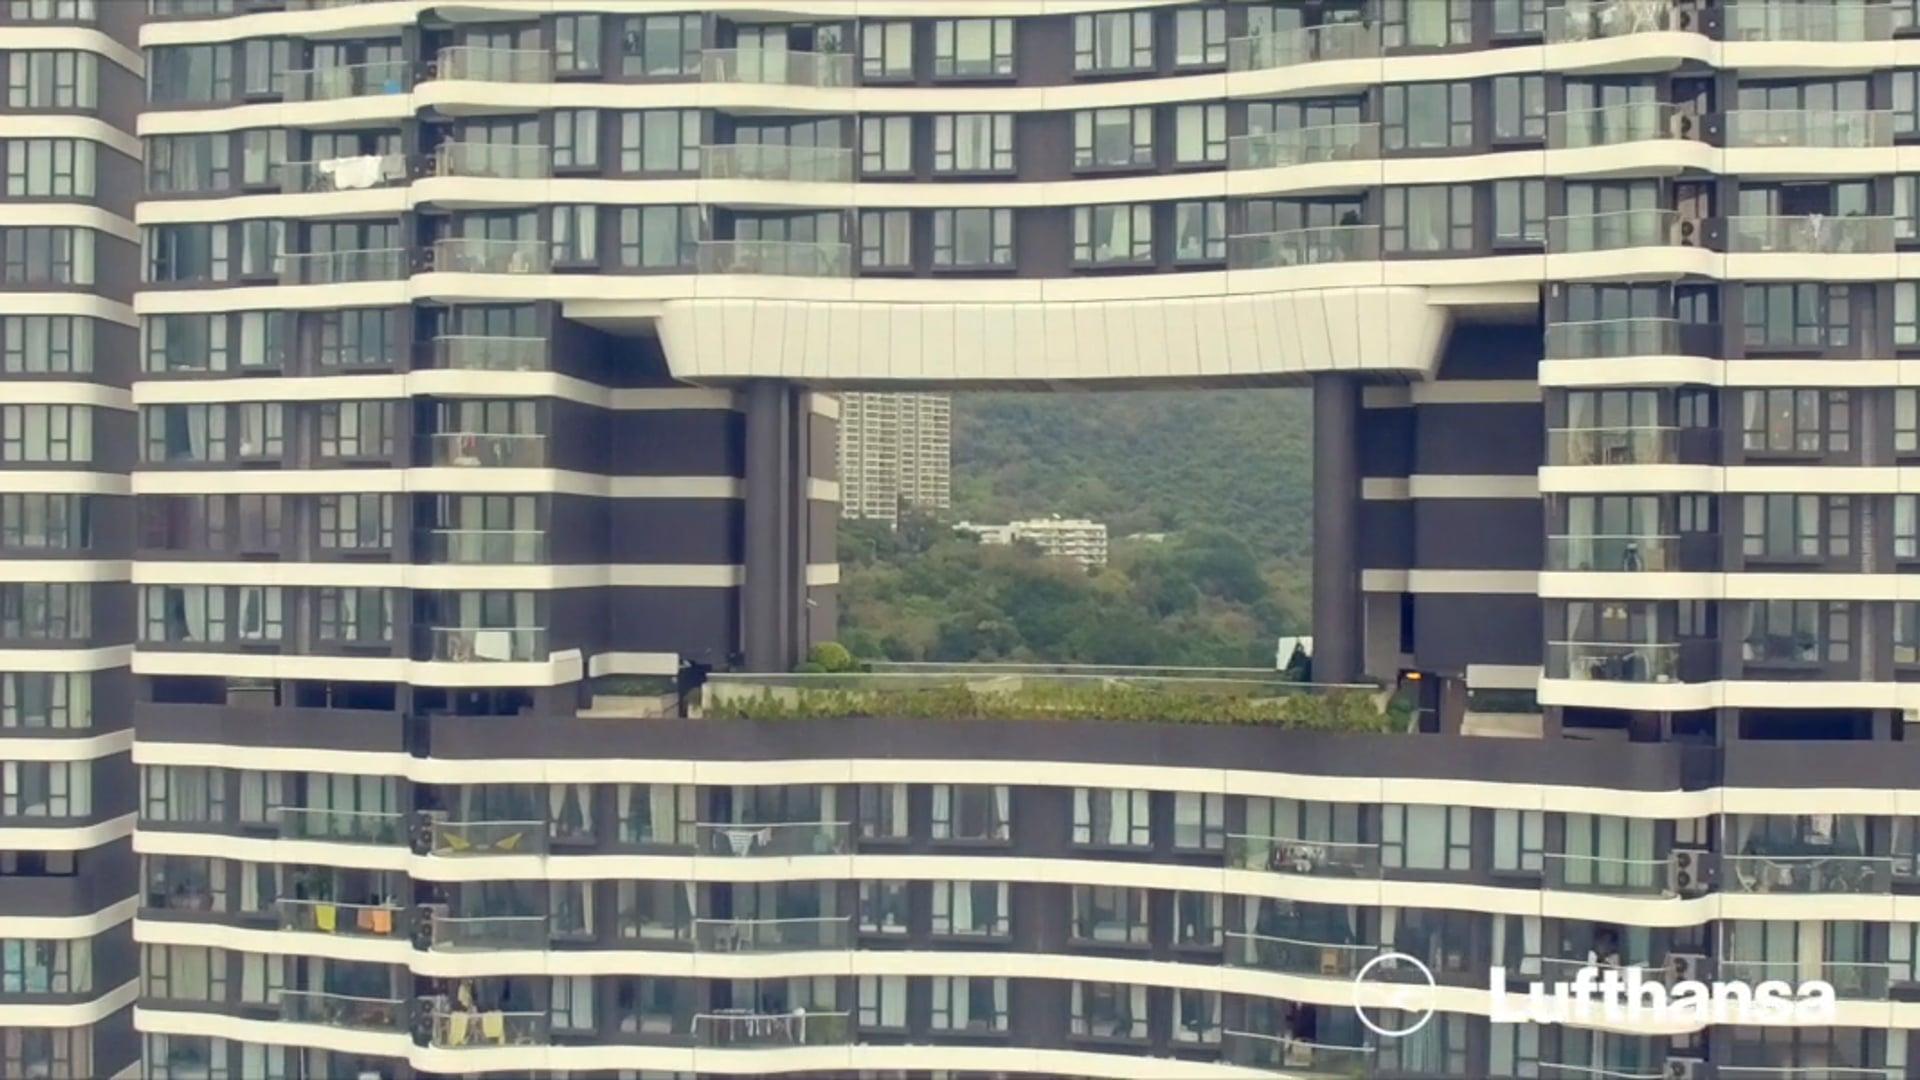 FILIP PISKORZYNSKI   LUFHANSA - Hongkong